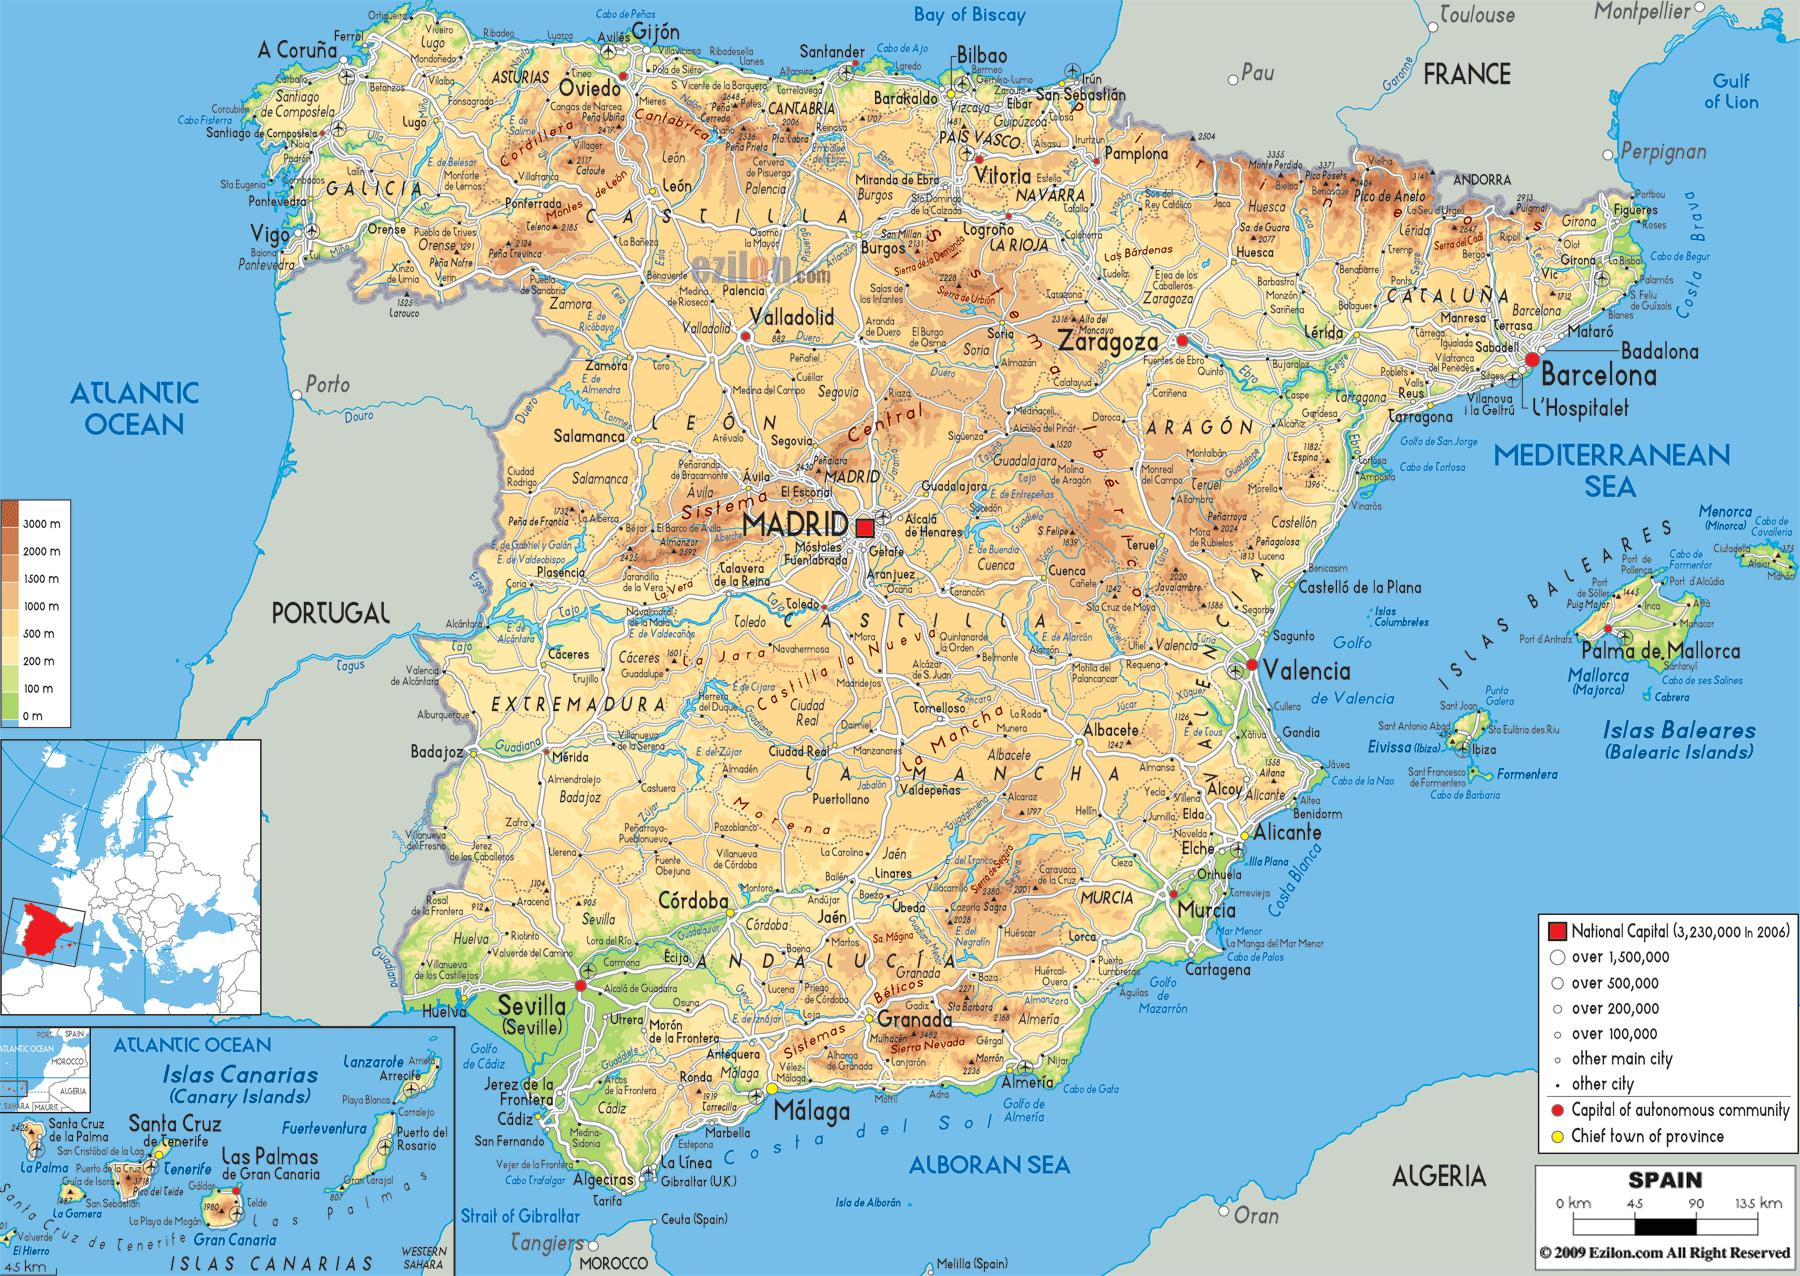 Cartina Mappa Spagna.Laghi In Spagna Mappa Cartina Della Spagna Laghi Europa Del Sud Europa